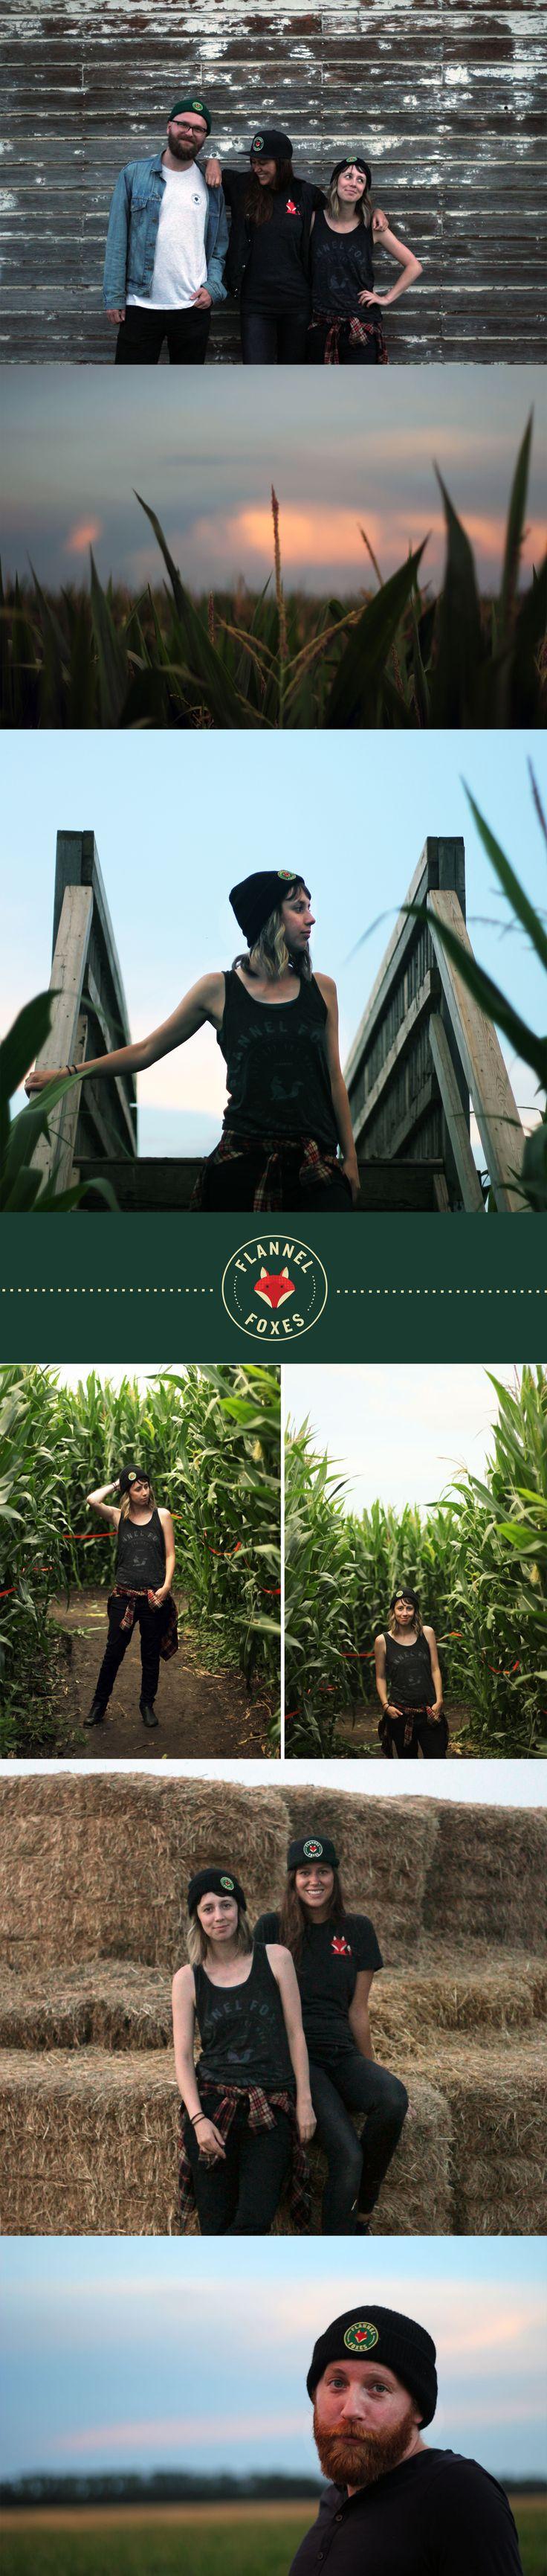 Flannel Foxes // Going Home // The Edmonton Corn Maze